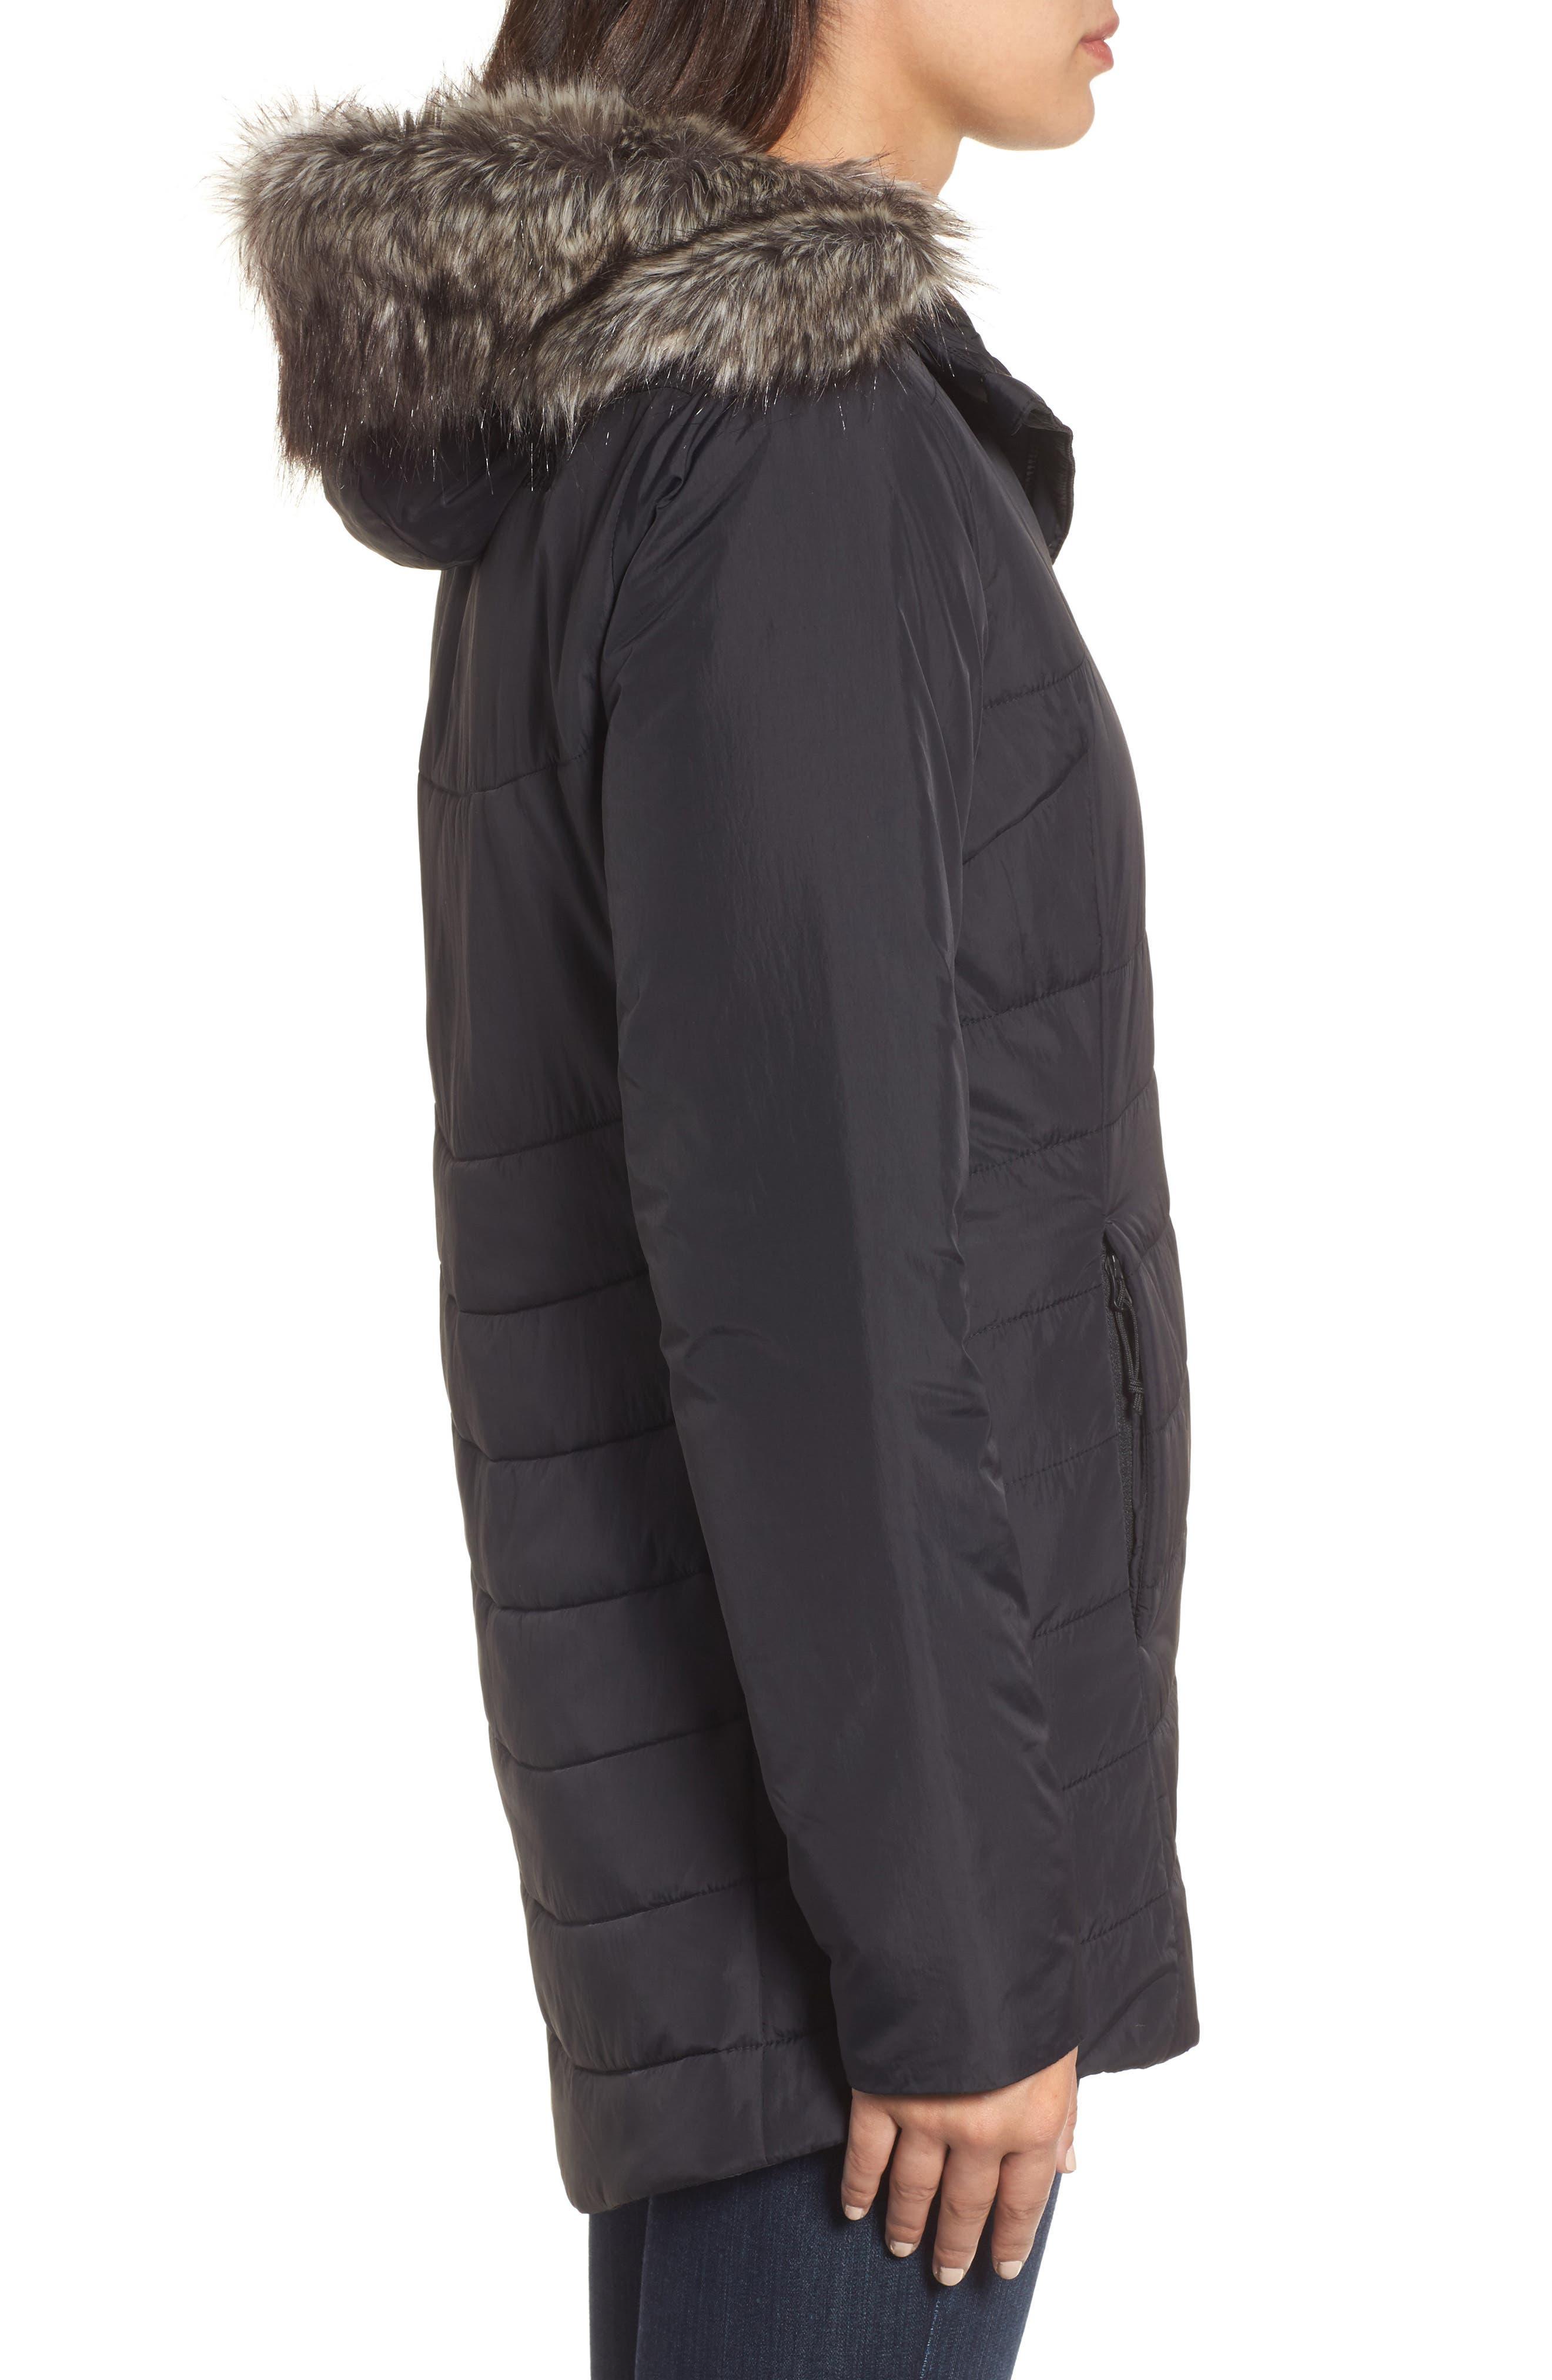 Alternate Image 3  - The North Face Harway Heatseeker™ Water-Resistant Jacket with Faux Fur Trim